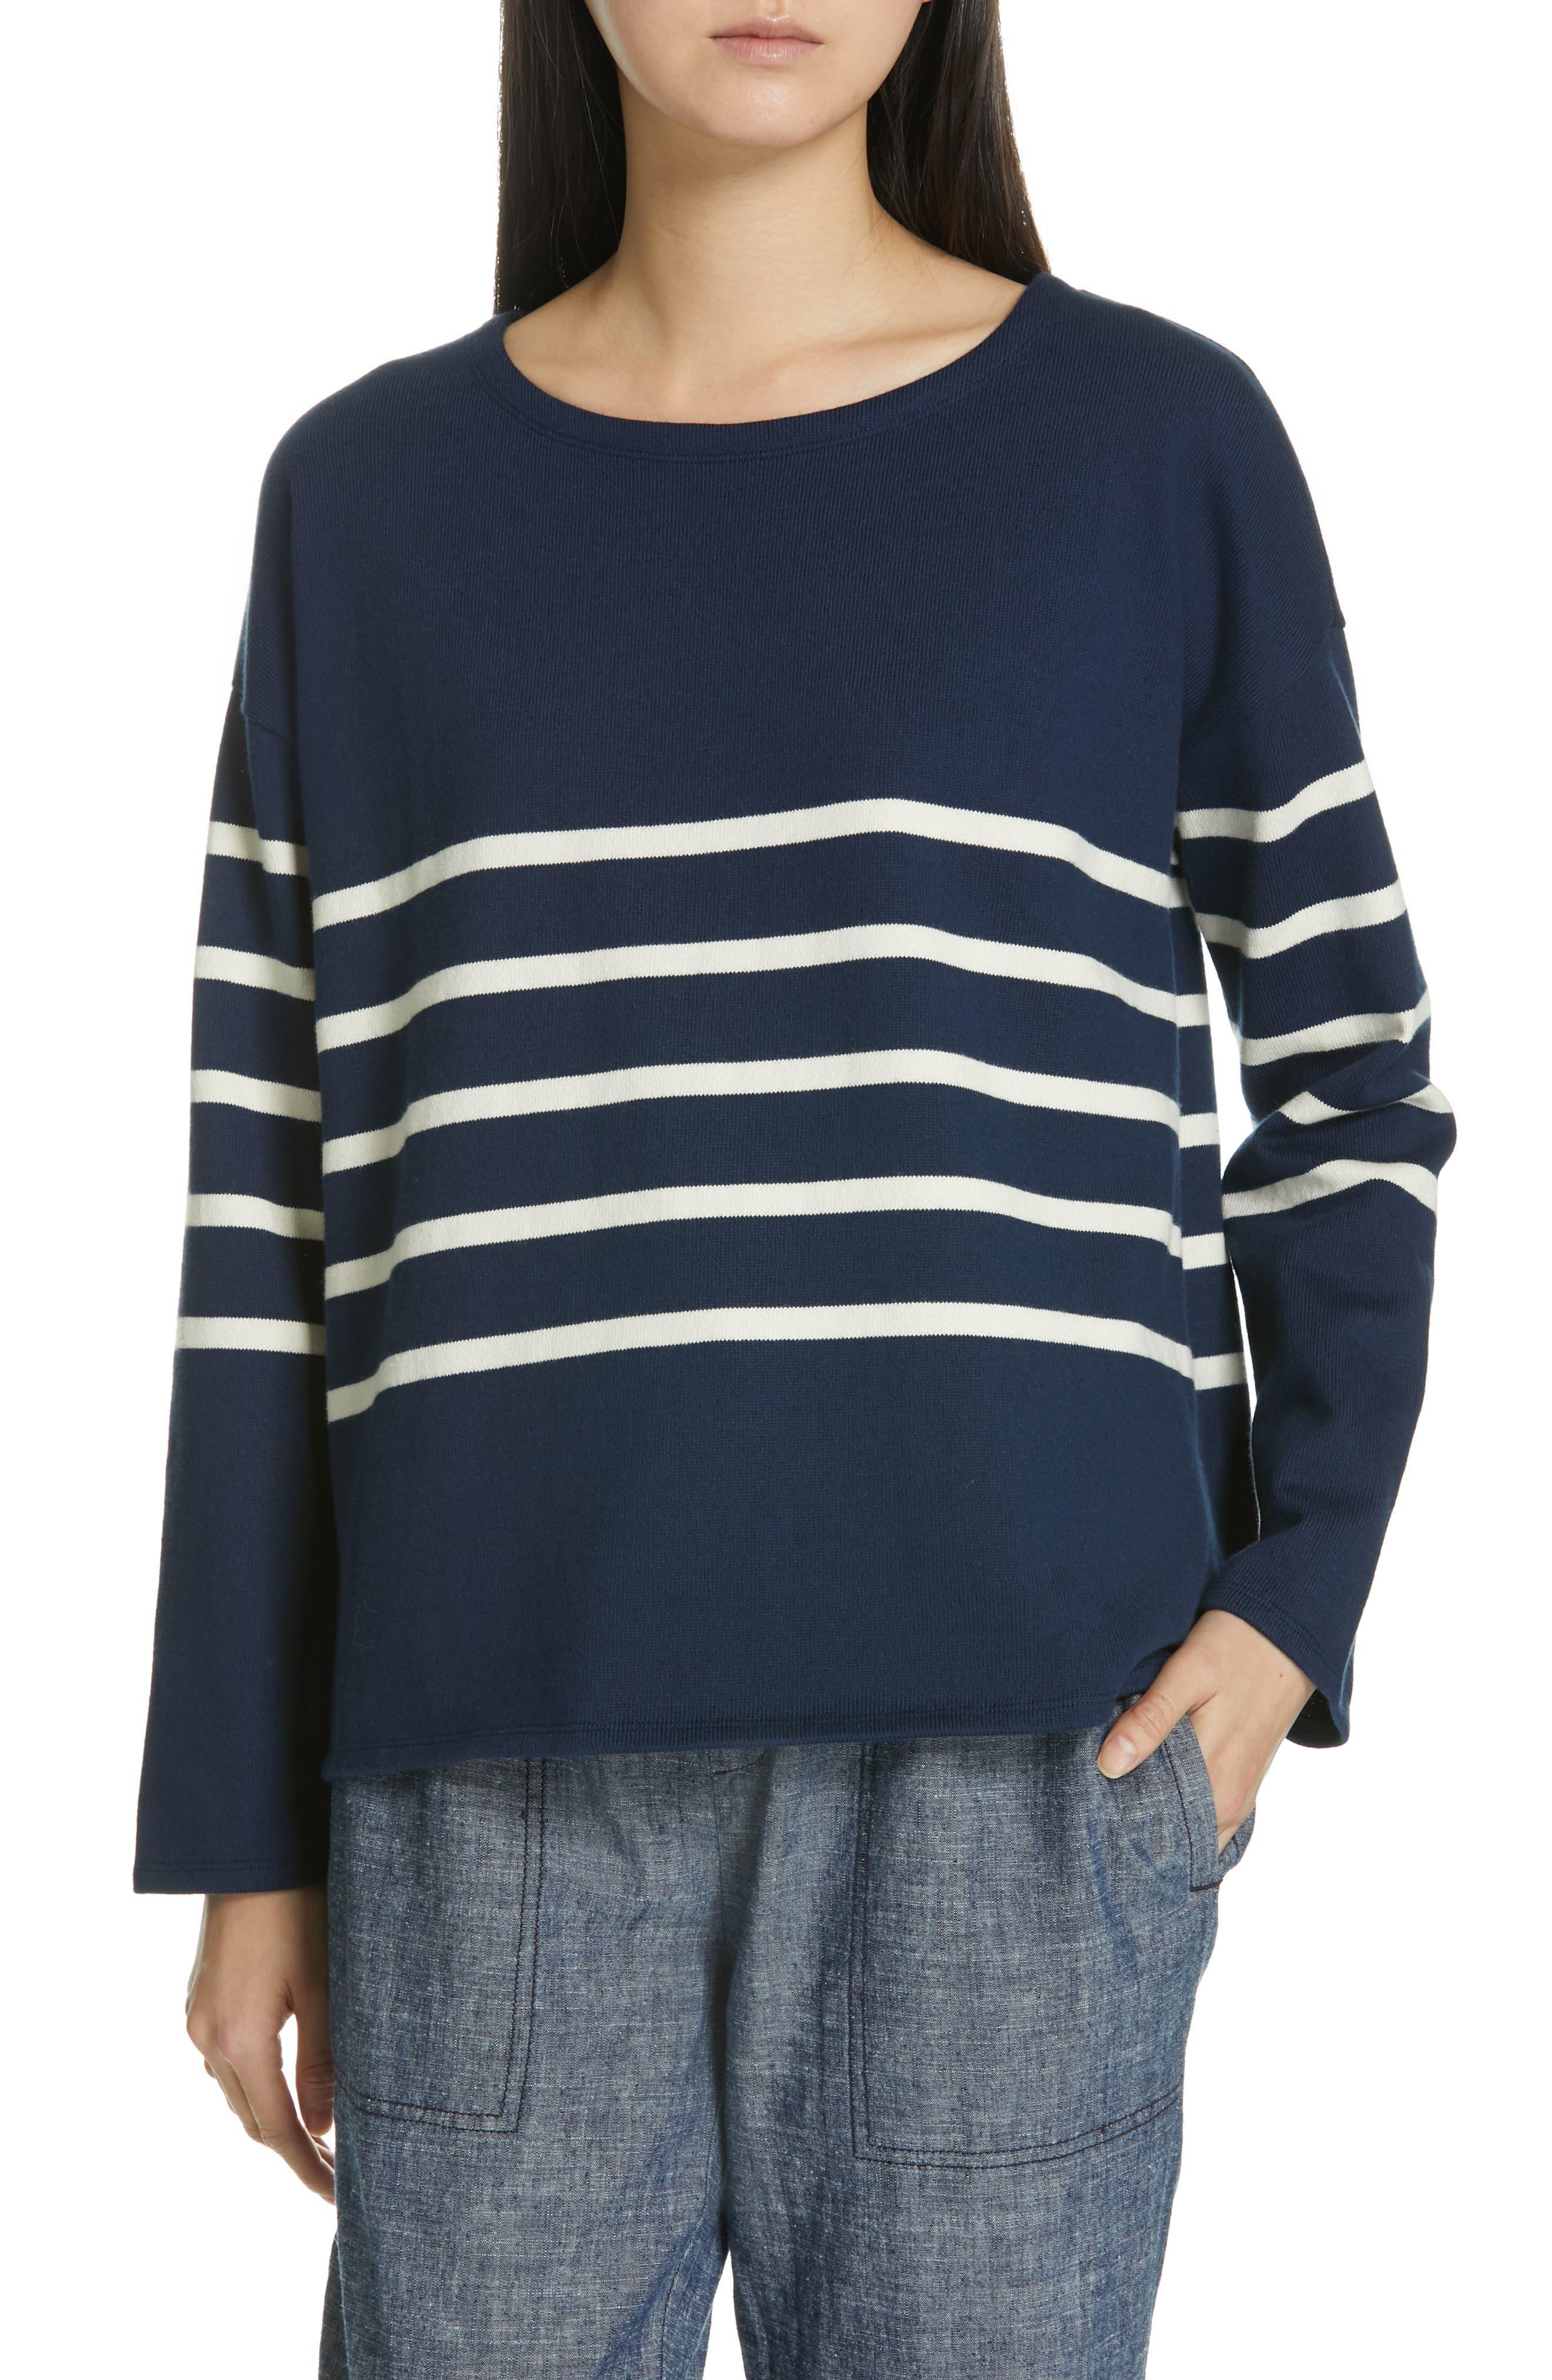 EILEEN FISHER, Stripe Organic Cotton Sweater, Main thumbnail 1, color, DENIM